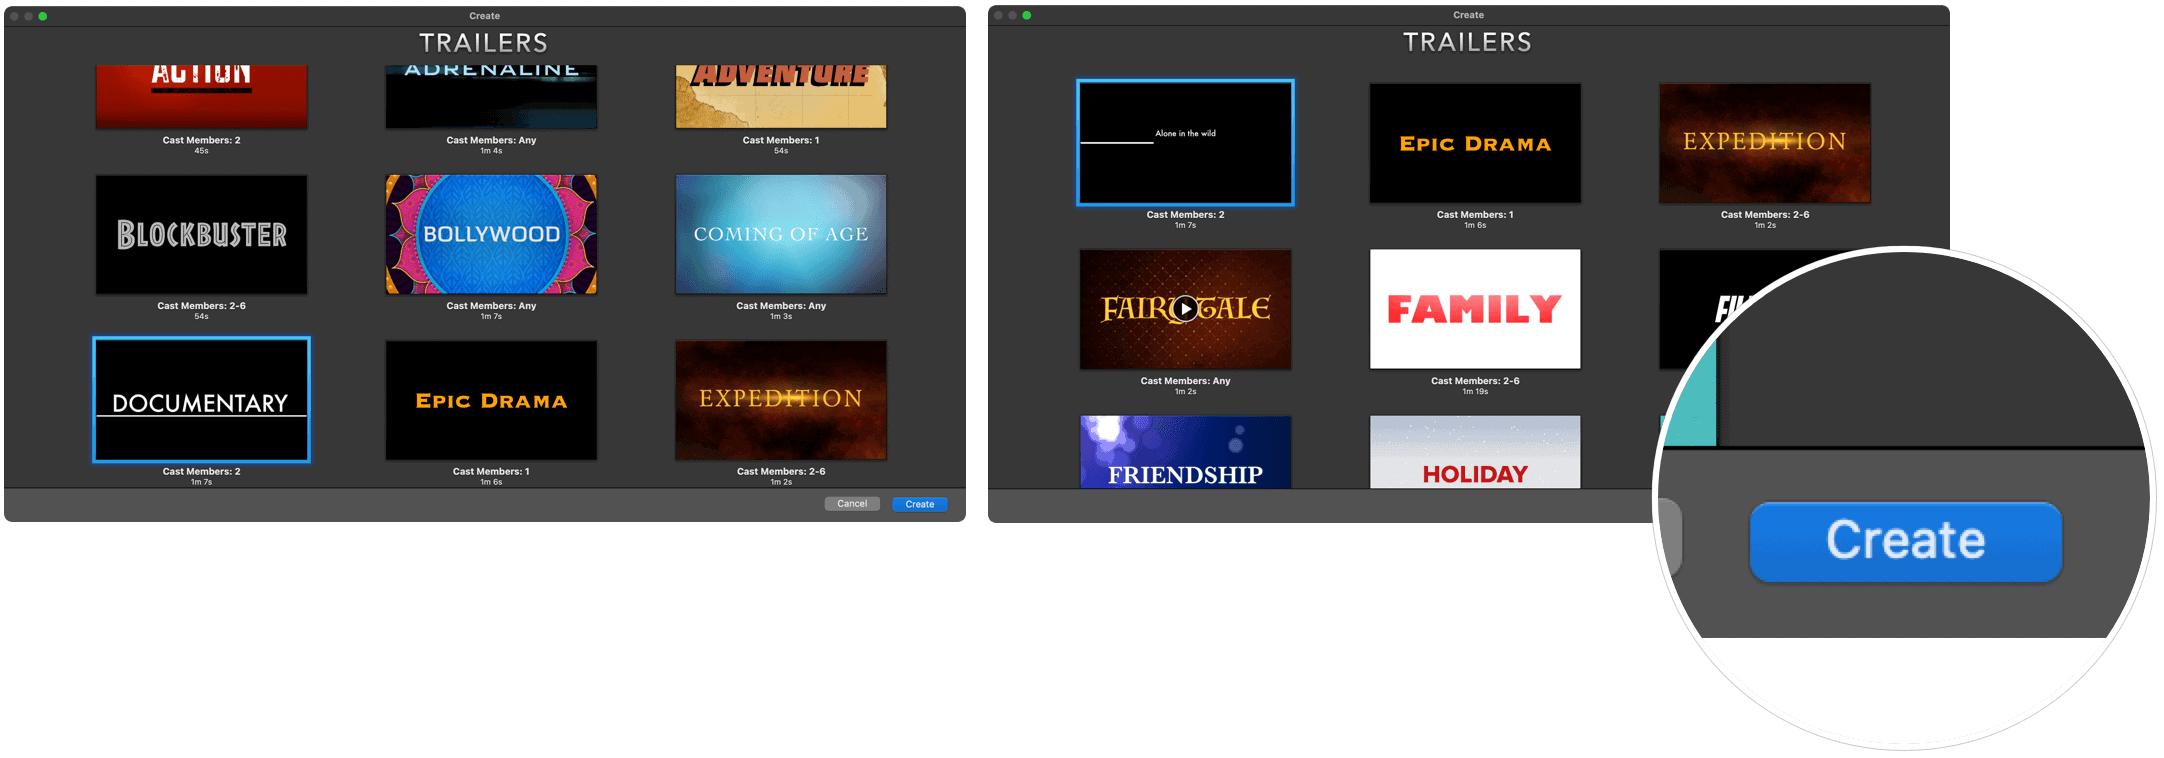 iMovie create trailer